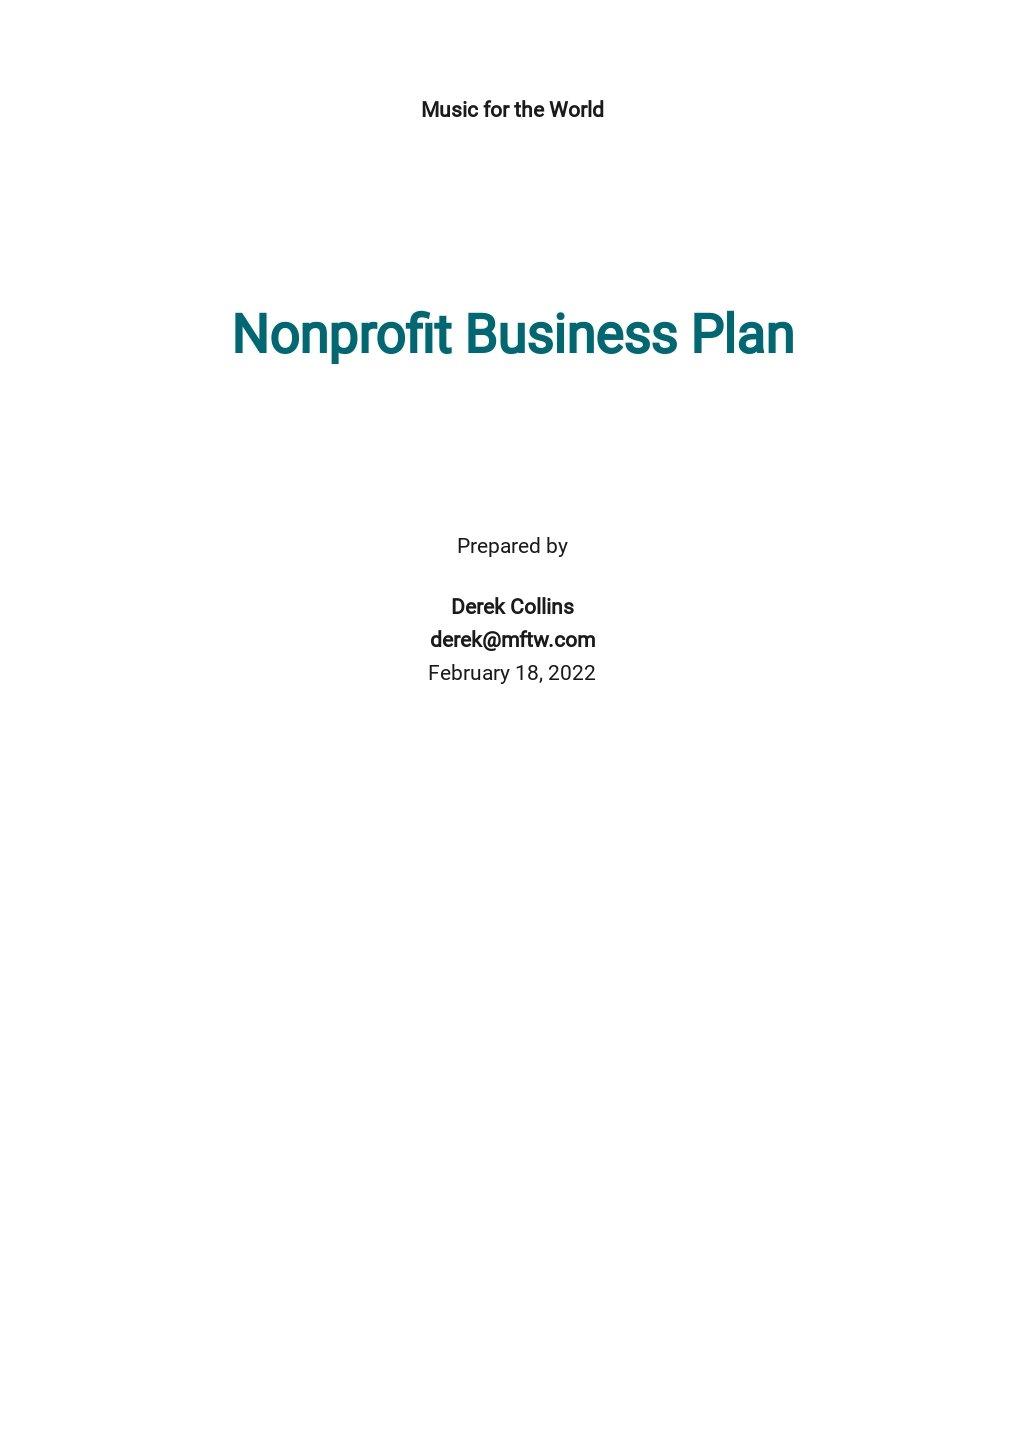 Nonprofit Business Plan Template